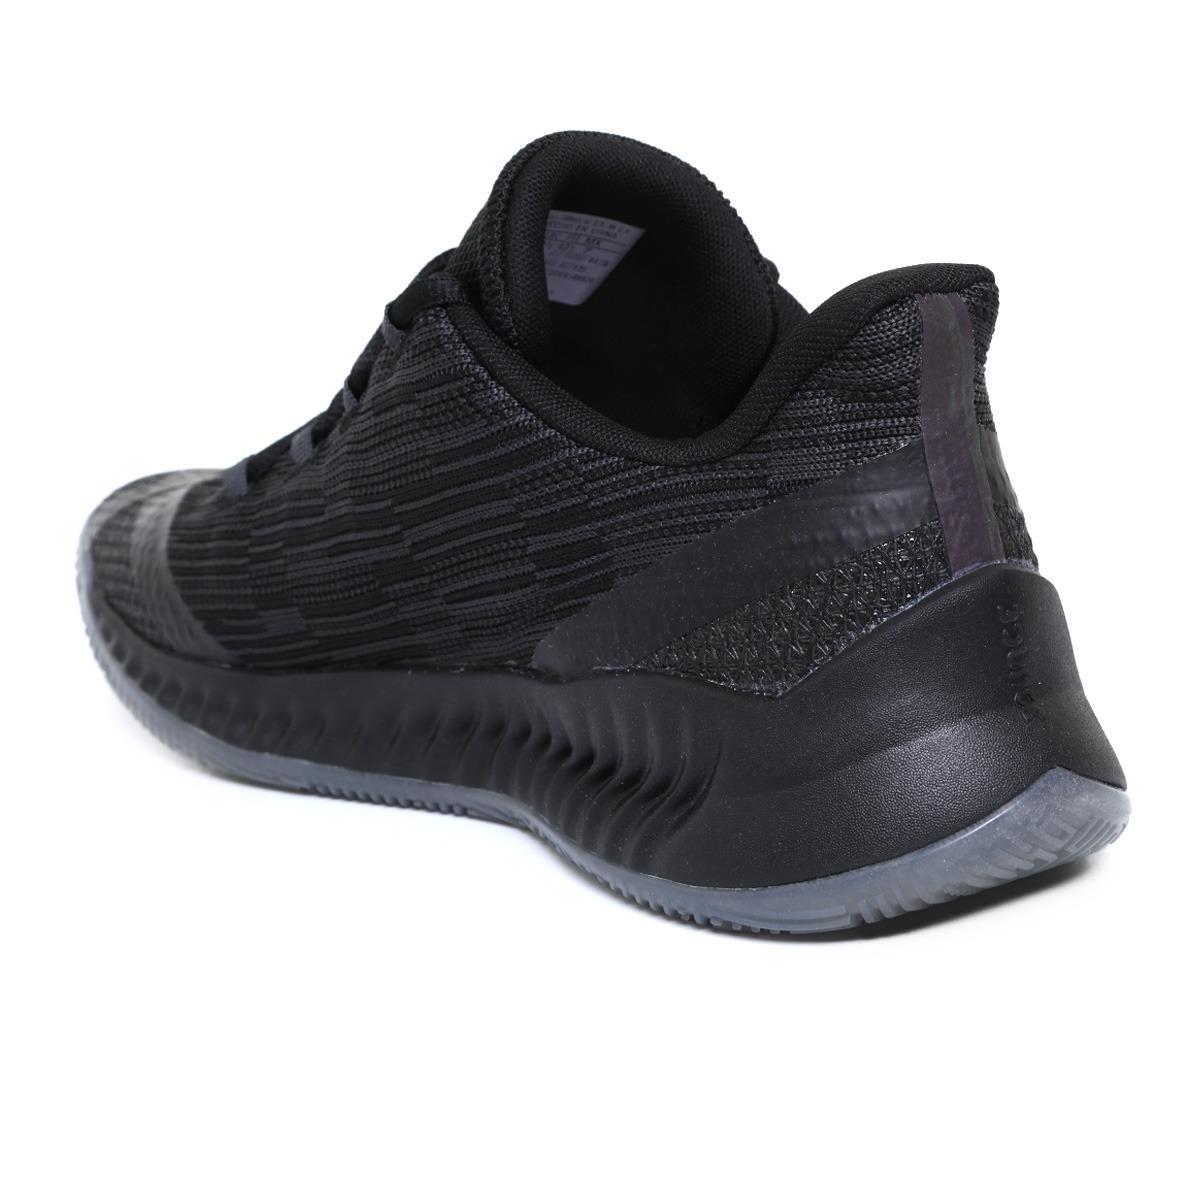 separation shoes d10a1 b7971 Cargando zoom... tenis adidas harden b e 2 negro basketball hombre